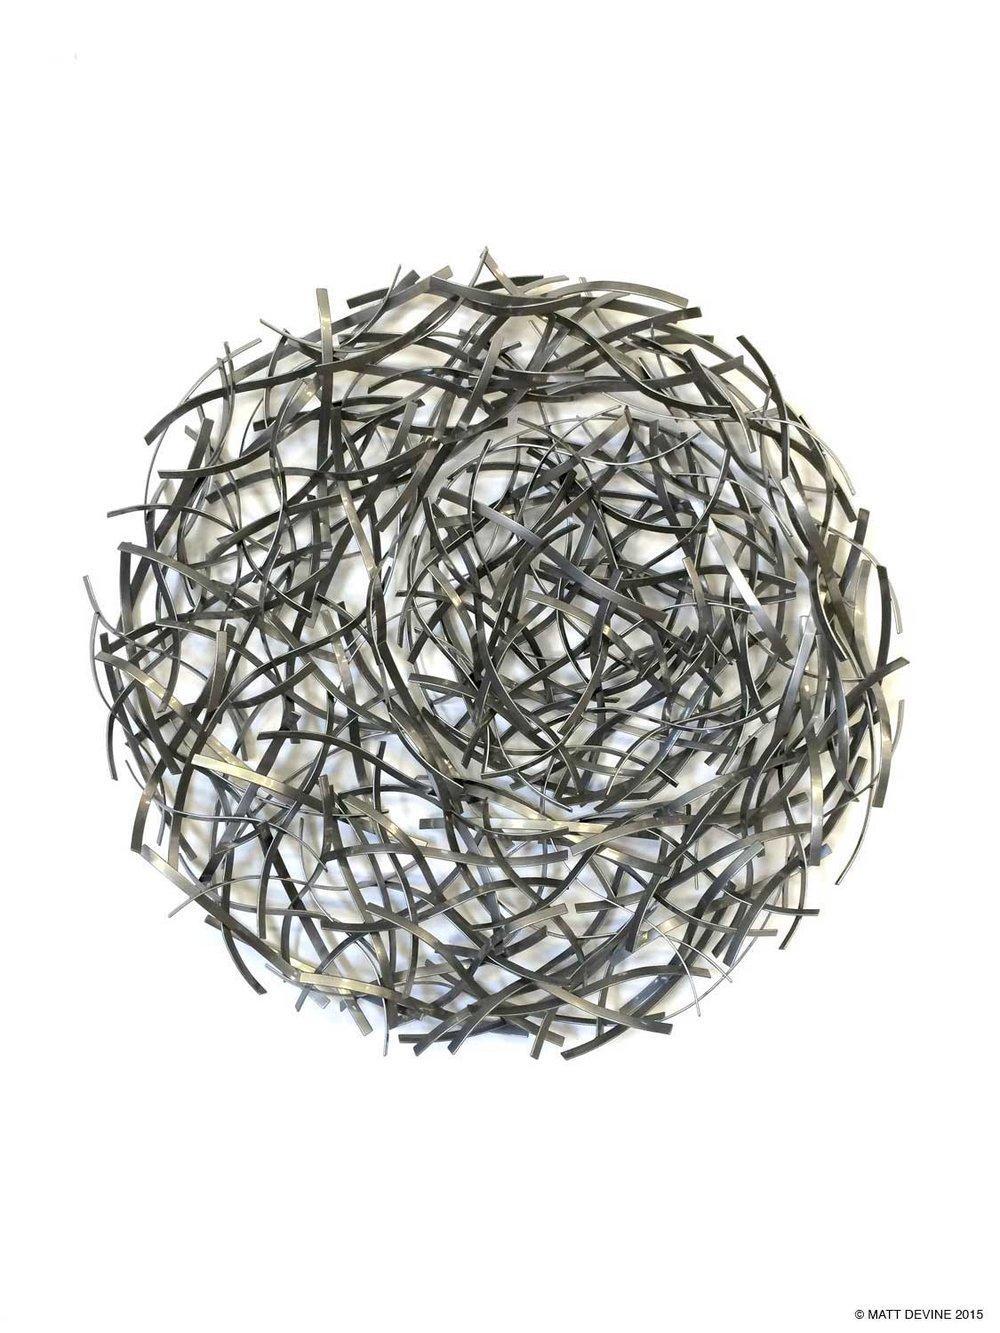 LUNA, 2015, steel with chrome powdercoat, 48H x 48W x 6D